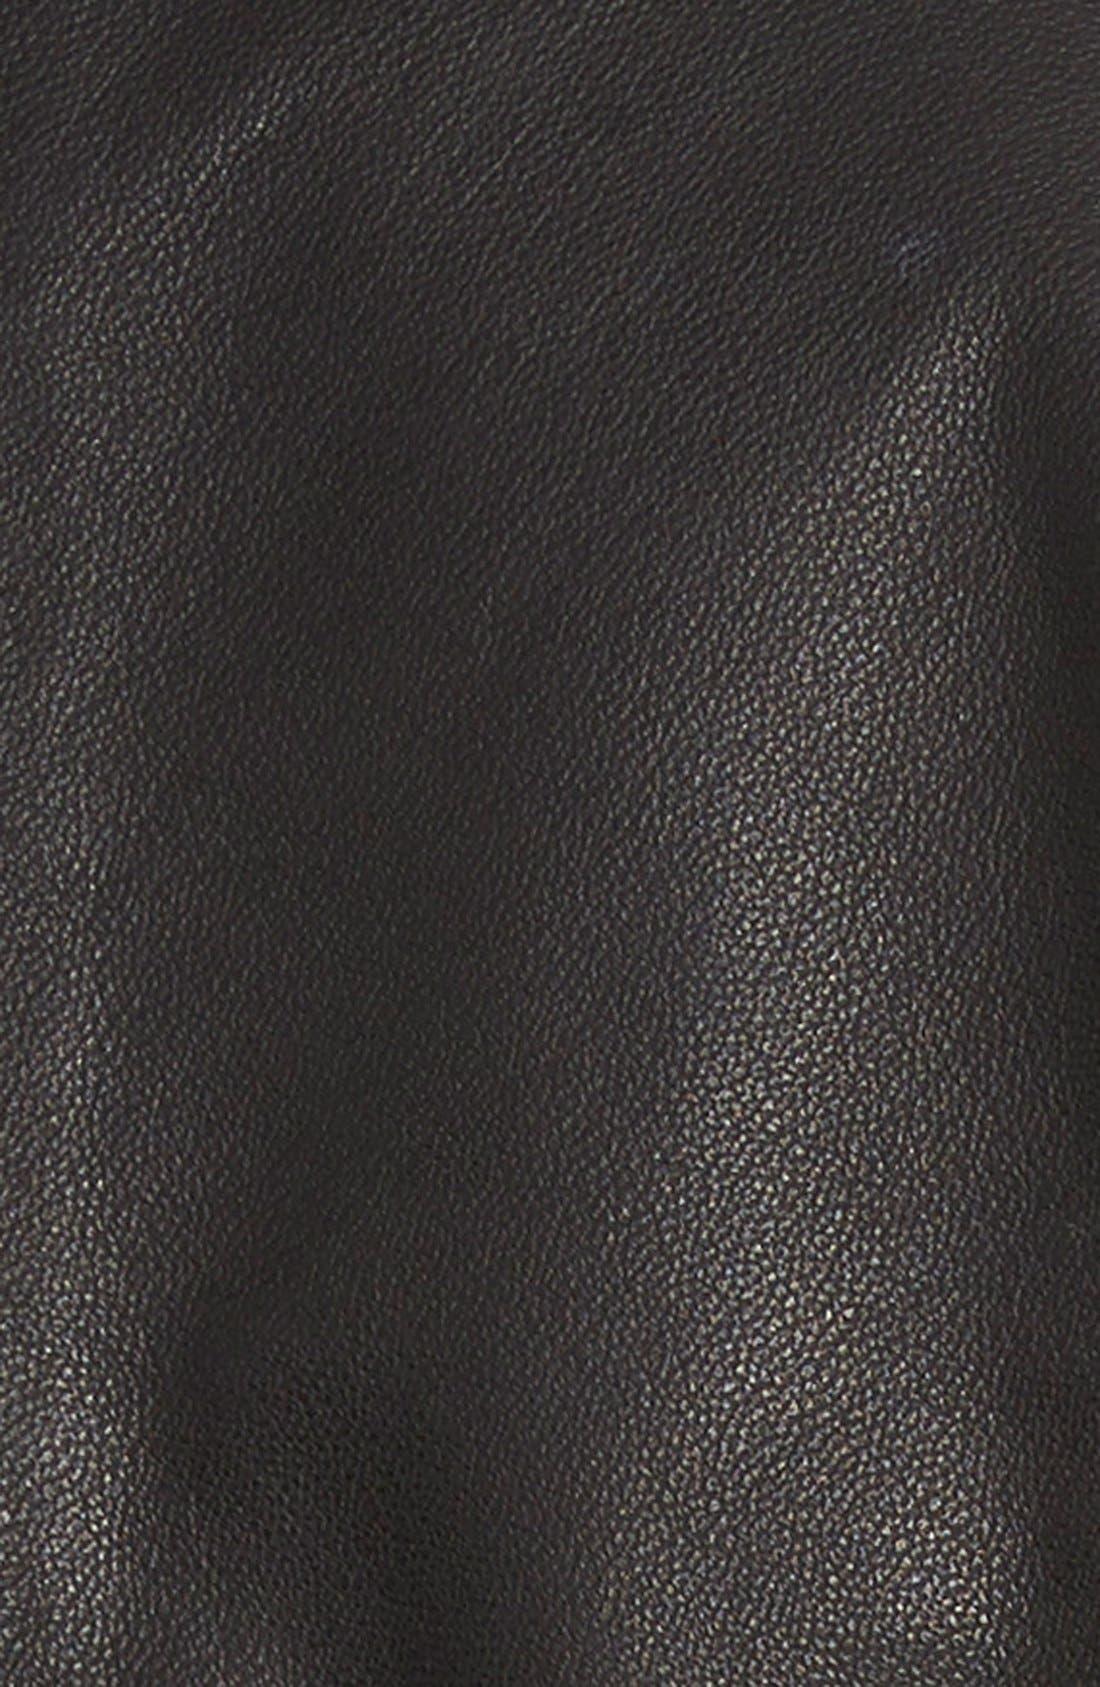 VOLCOM,                             'Stone Row' Moto Leather Jacket,                             Alternate thumbnail 3, color,                             001